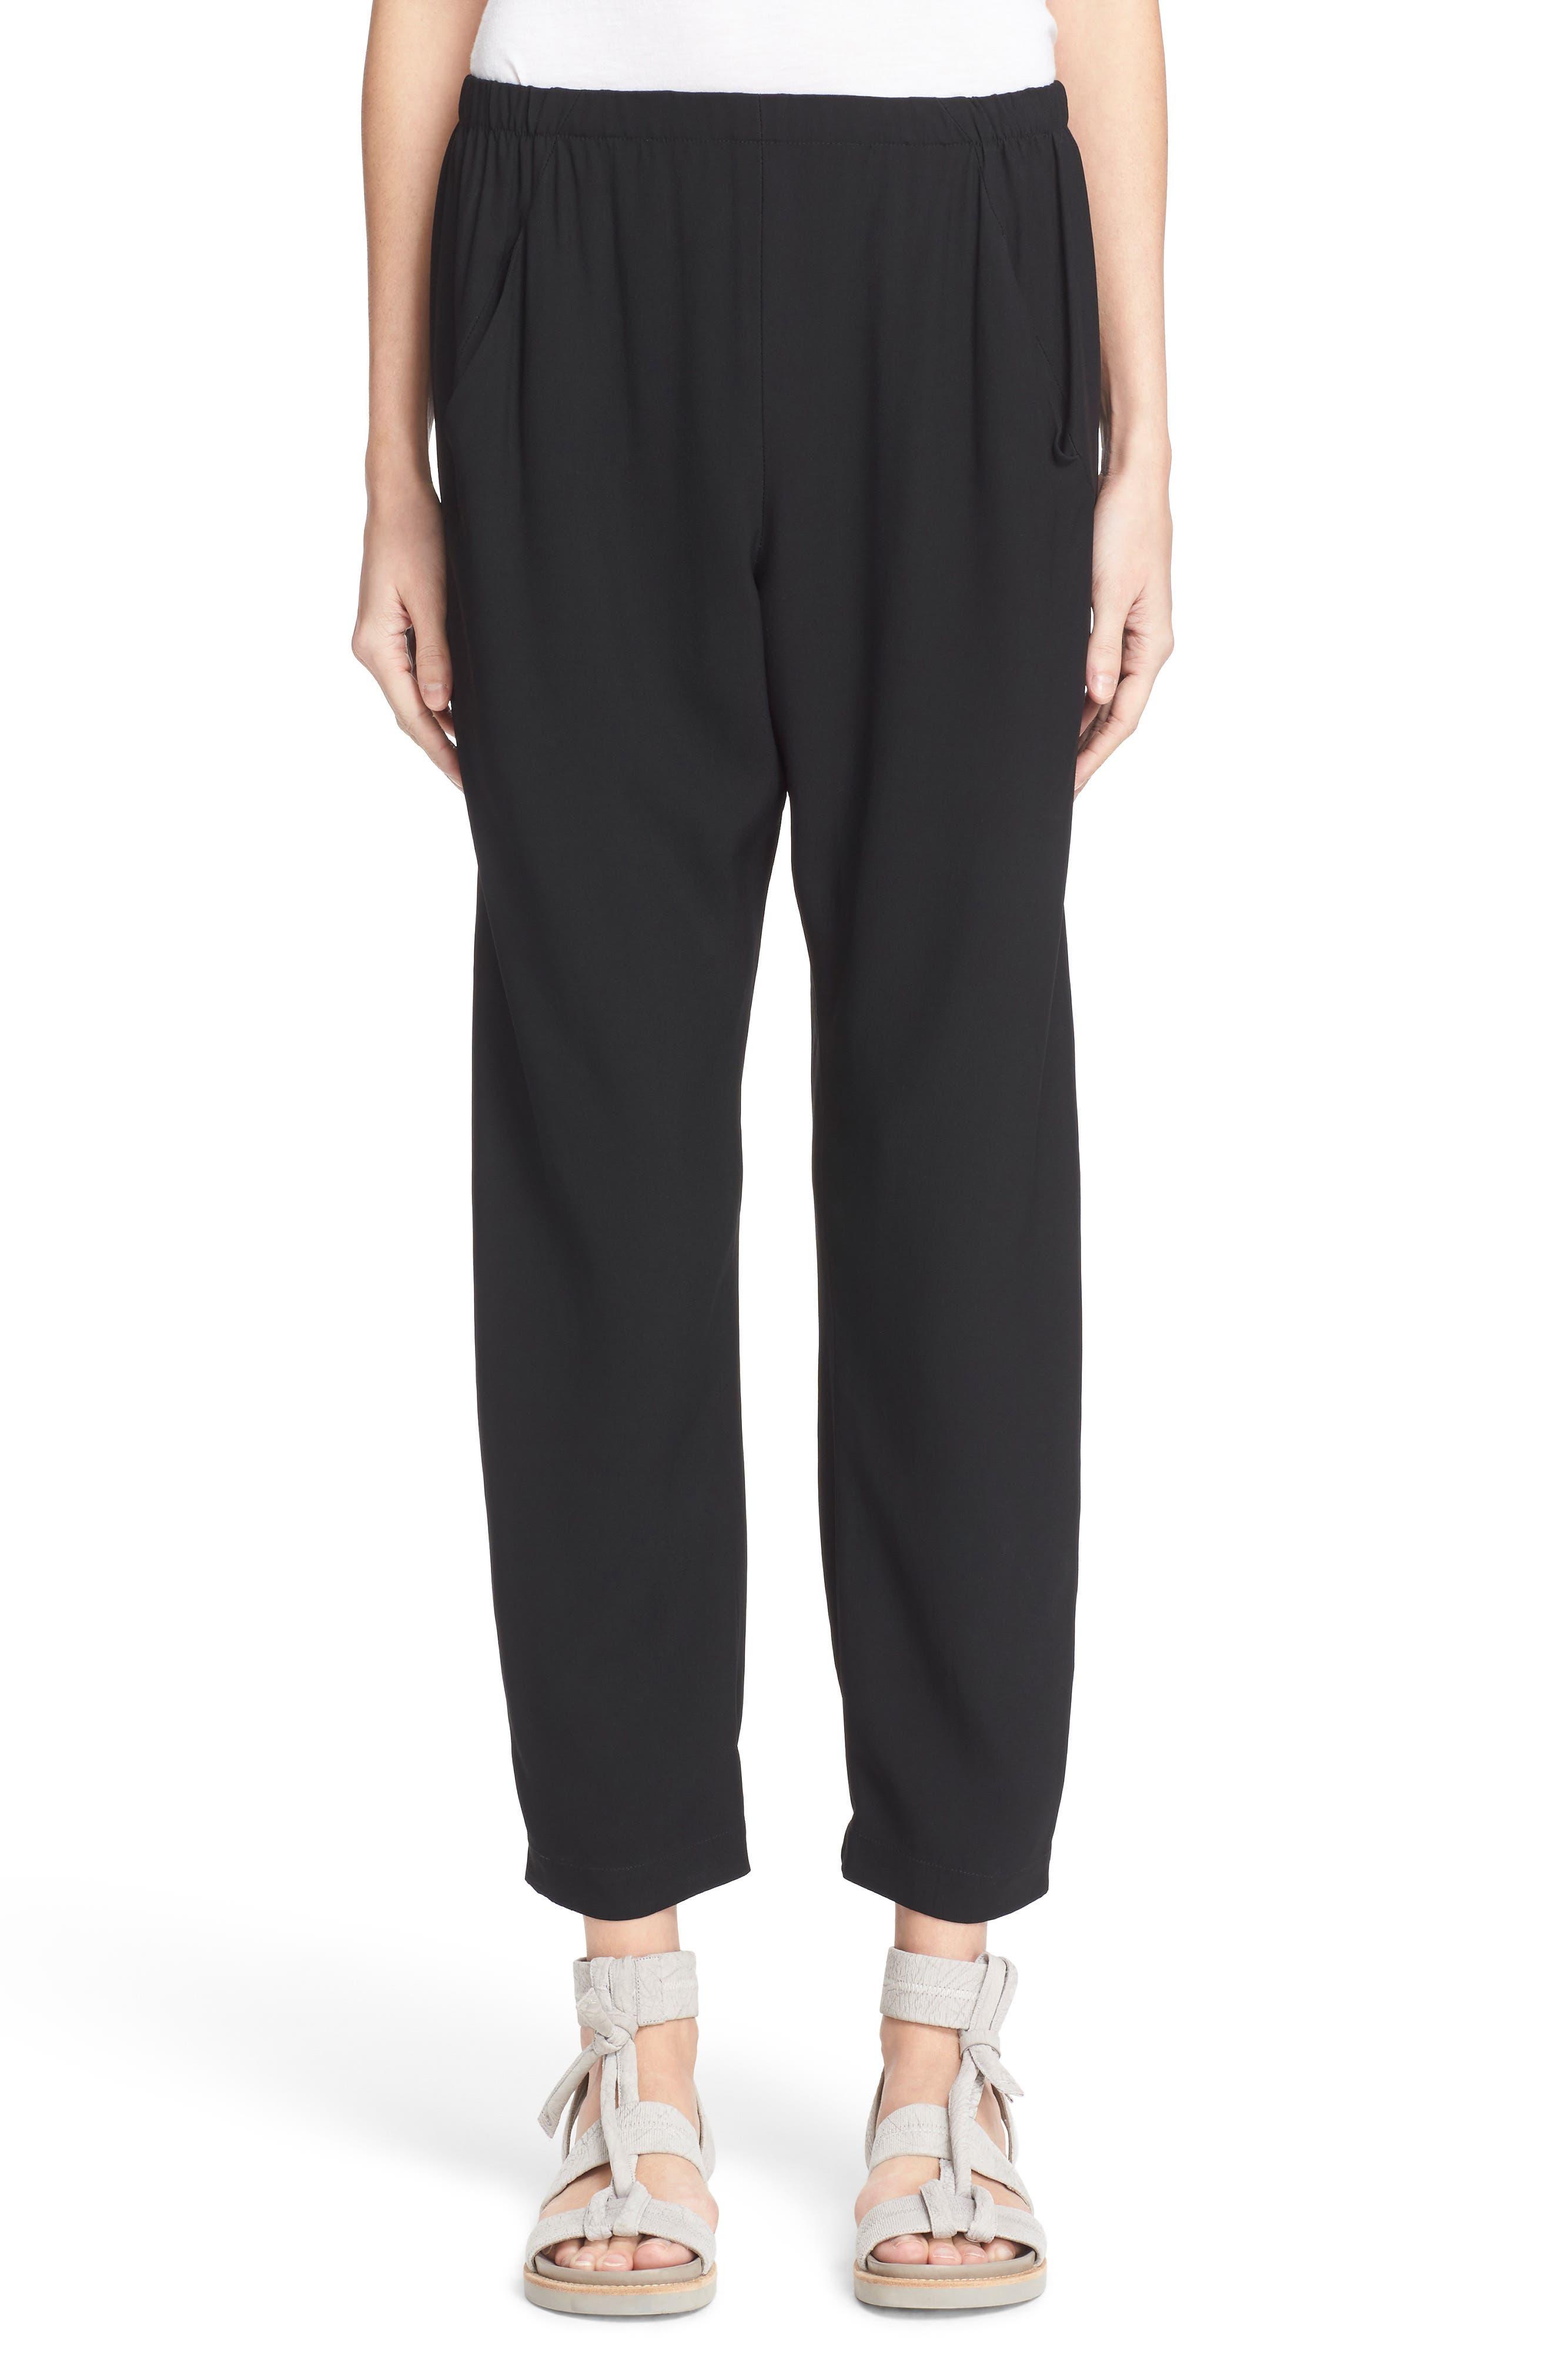 Main Image - Zero + Maria Cornejo Gabi Drape Trousers